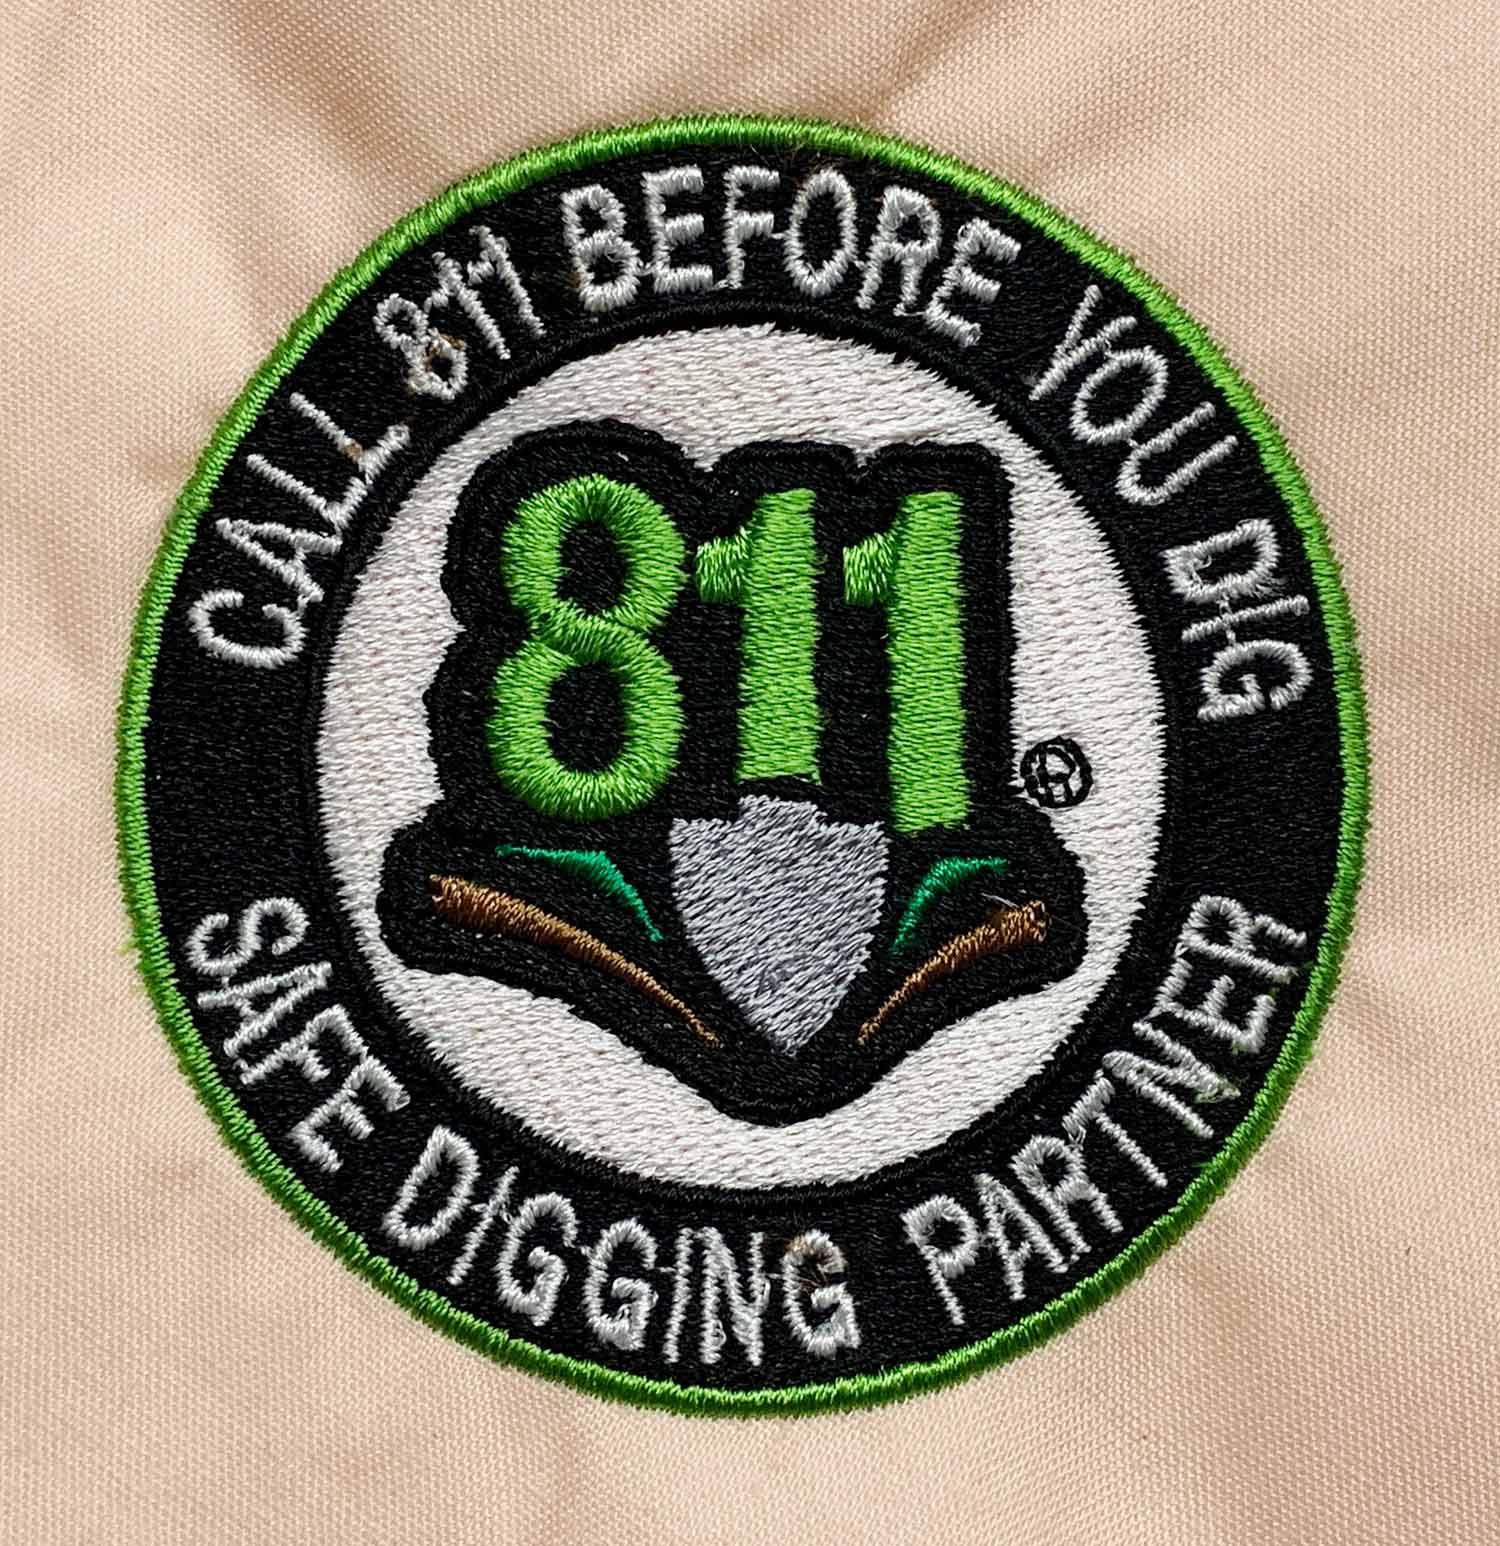 KYC_CALL-811-BEFORE-YOU-DIG-SAFE-DIGGING-PARTNER_web.jpg